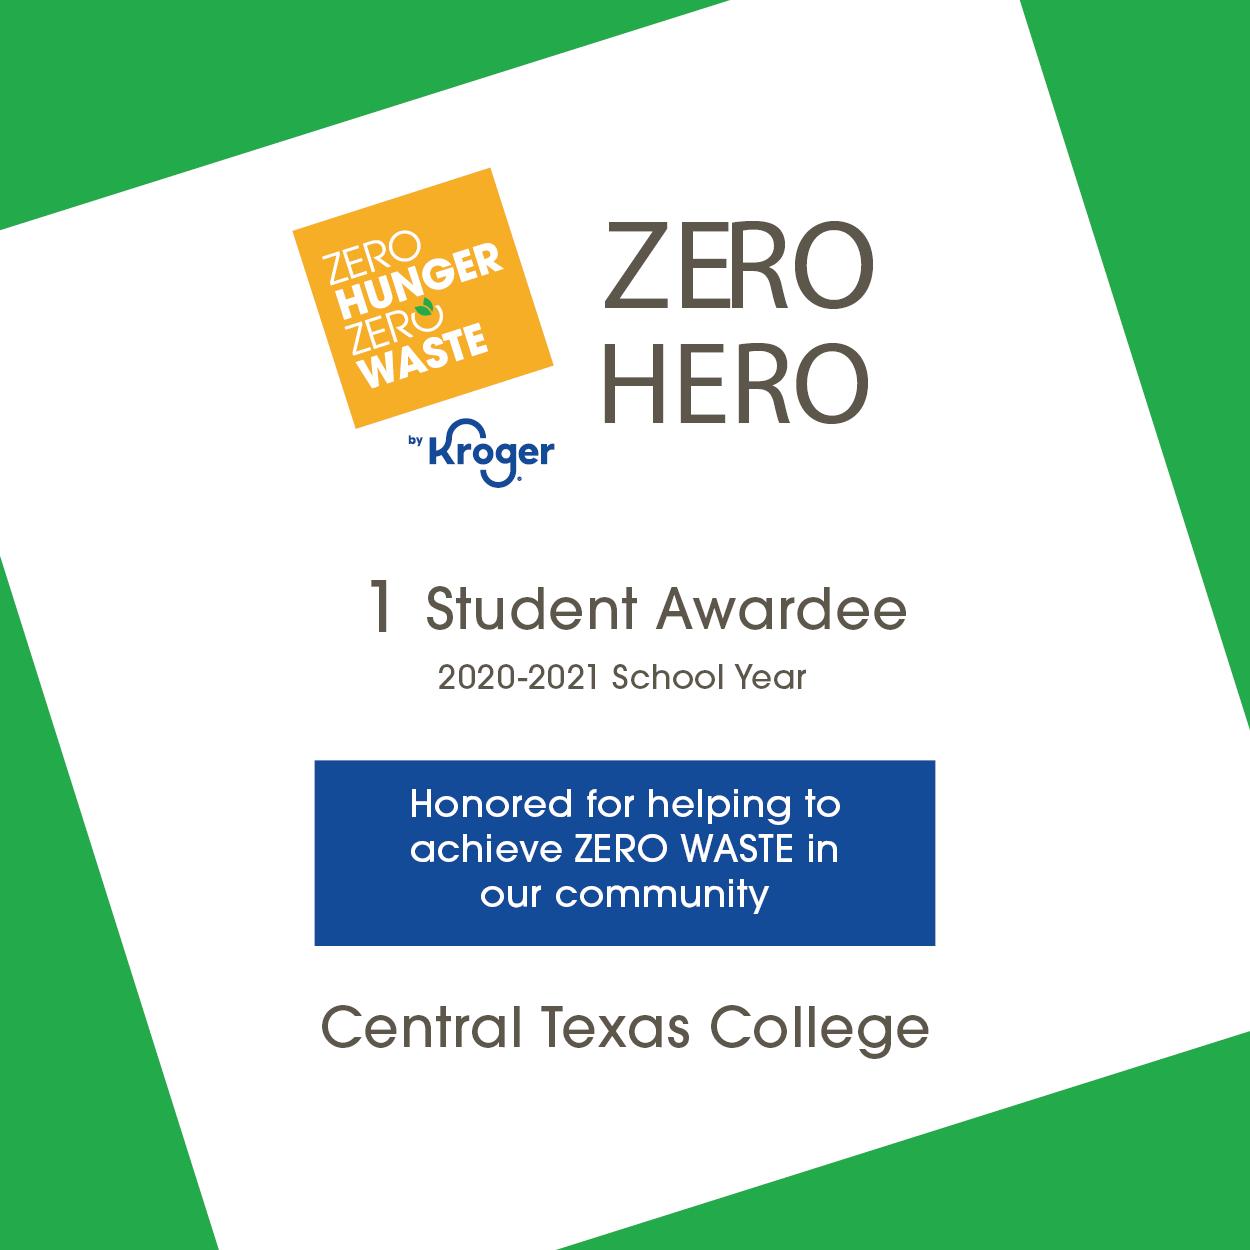 2020-21 Zero Hero Awards